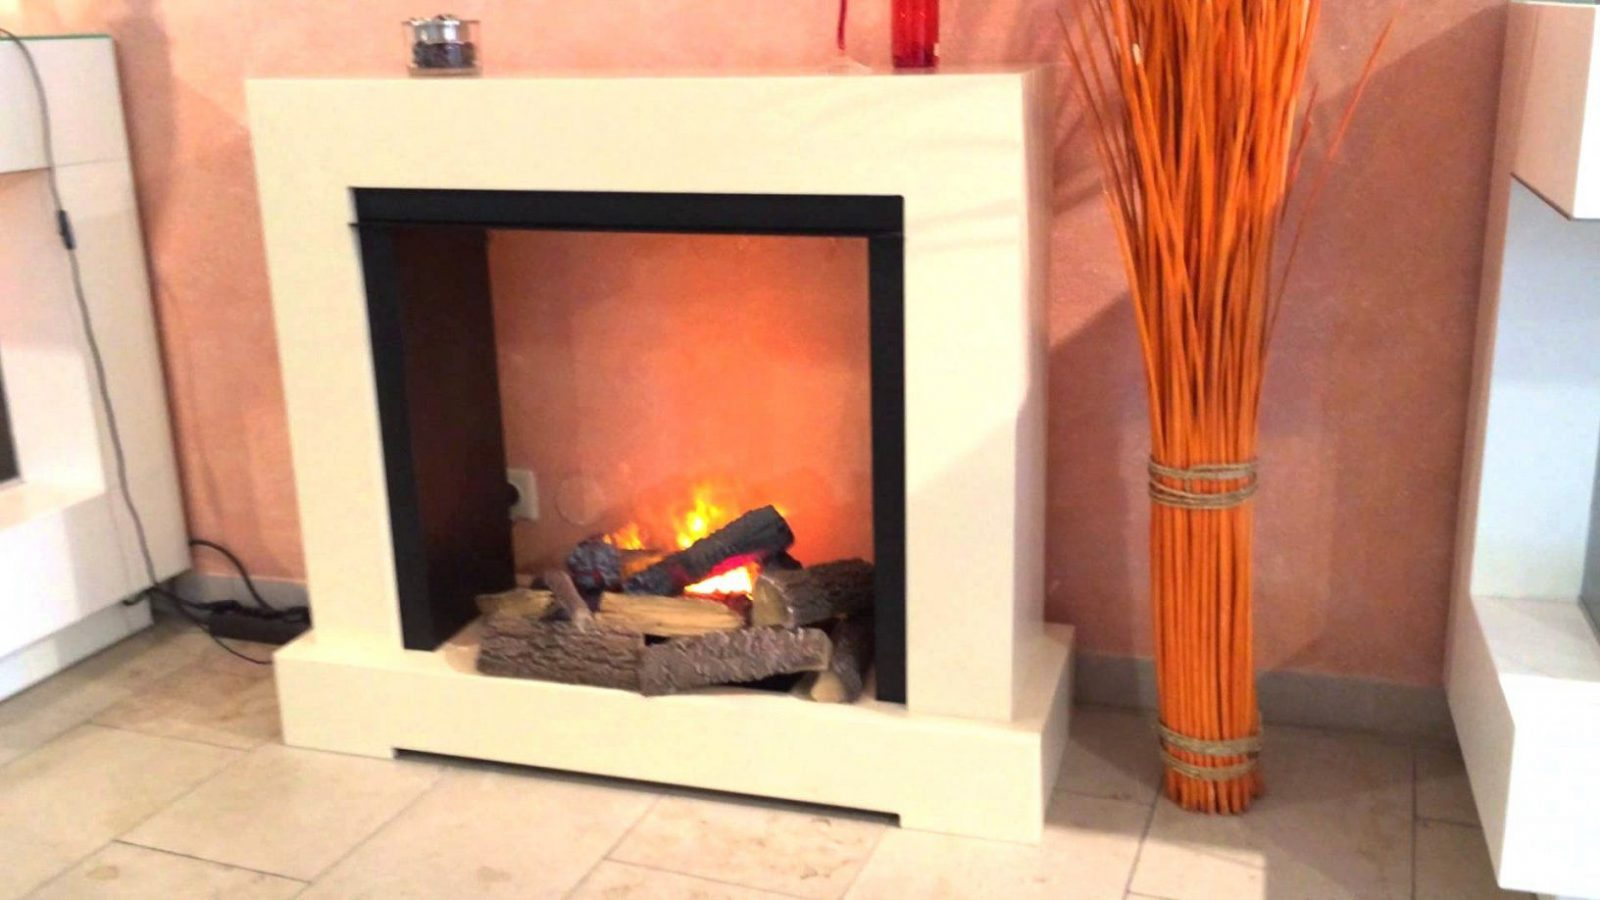 wandfarbe f r kaminofen neu kamin attrappe selber bauen anleitung von kamin selbst bauen. Black Bedroom Furniture Sets. Home Design Ideas